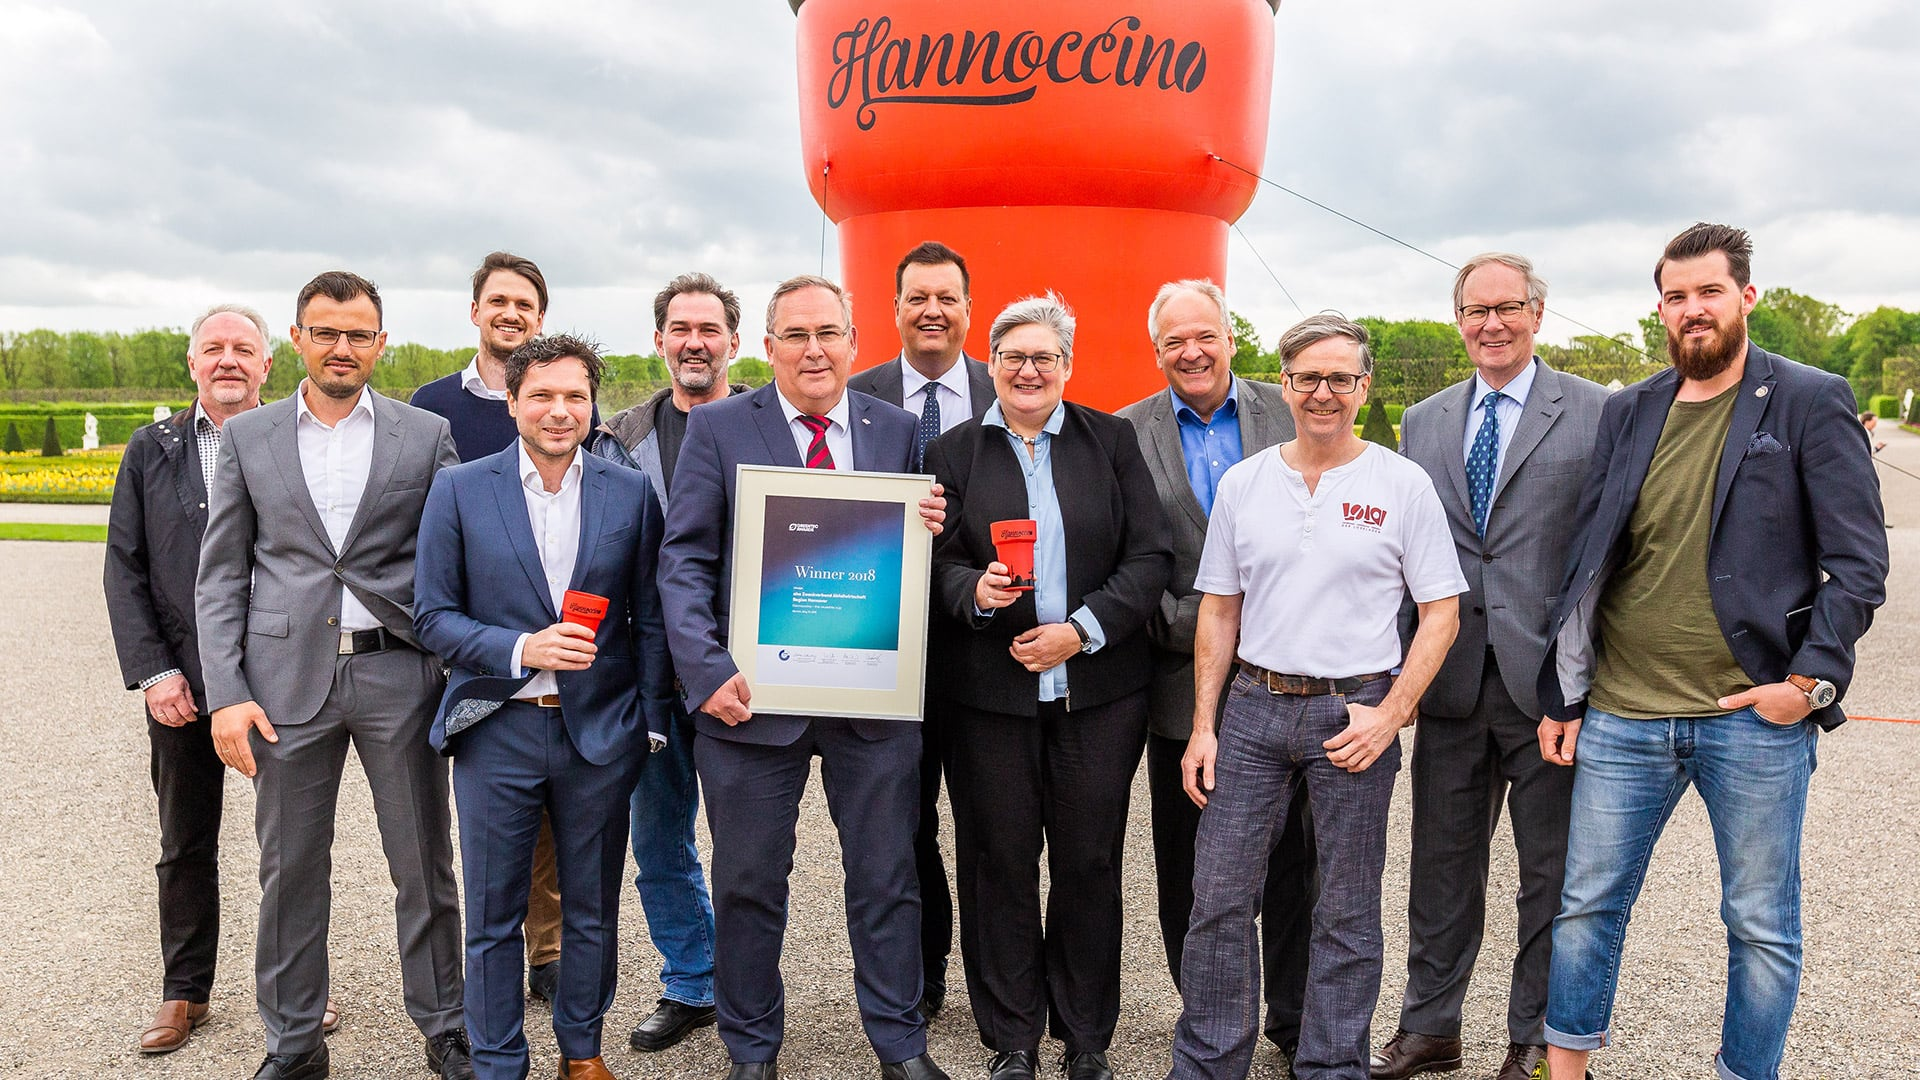 Hannoccino-GreentecAward-Verleihung-Hannover-Gruppenbild_gross